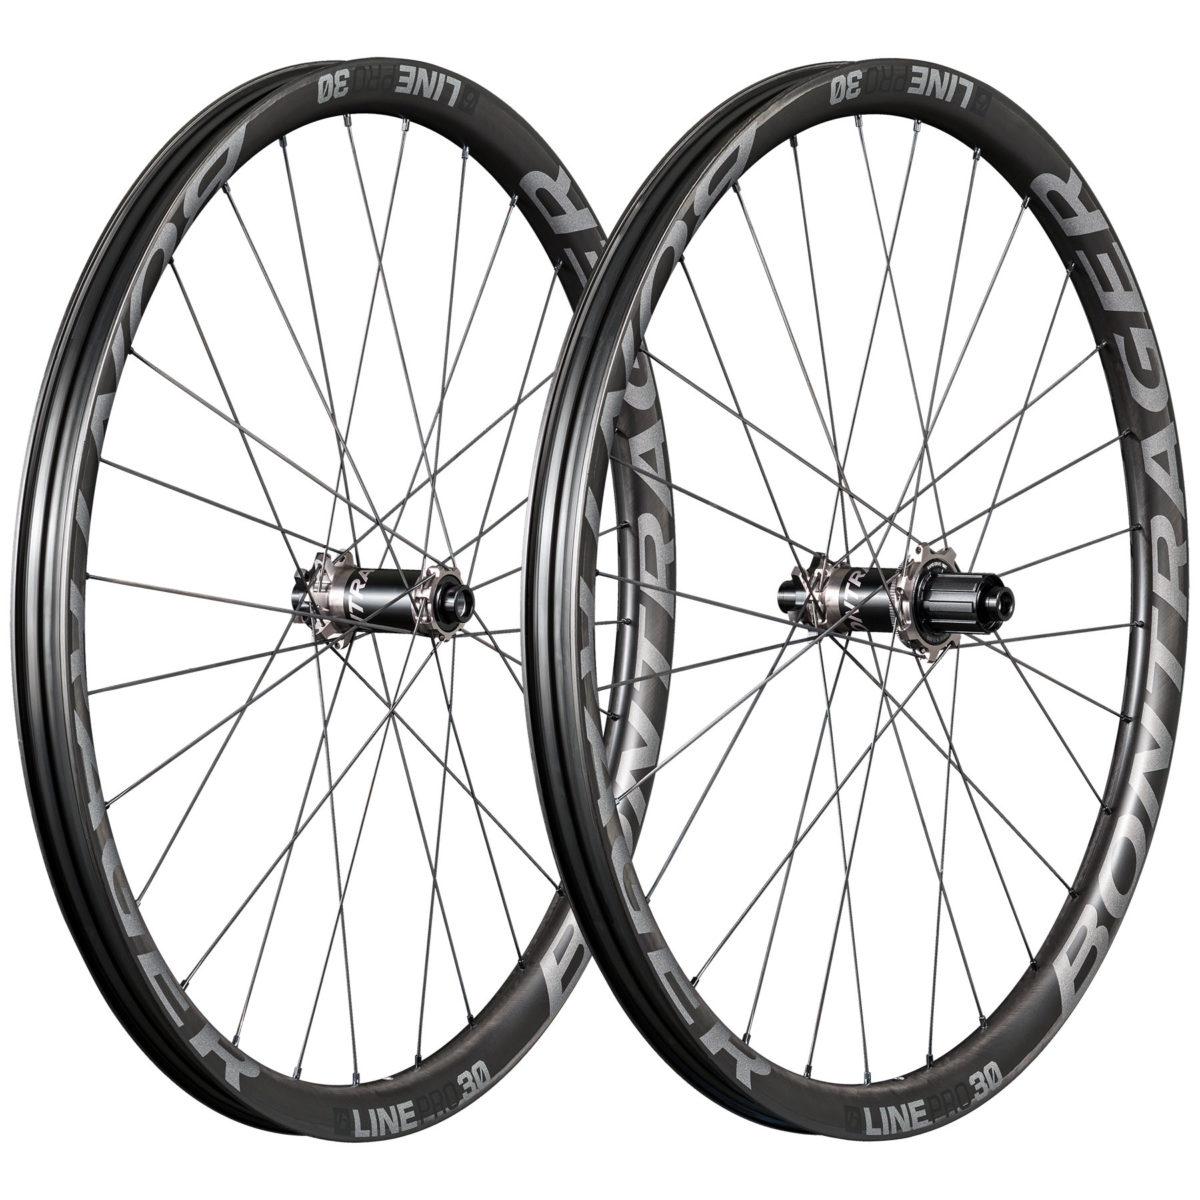 14953_A_2_Line_Pro_30_Wheel